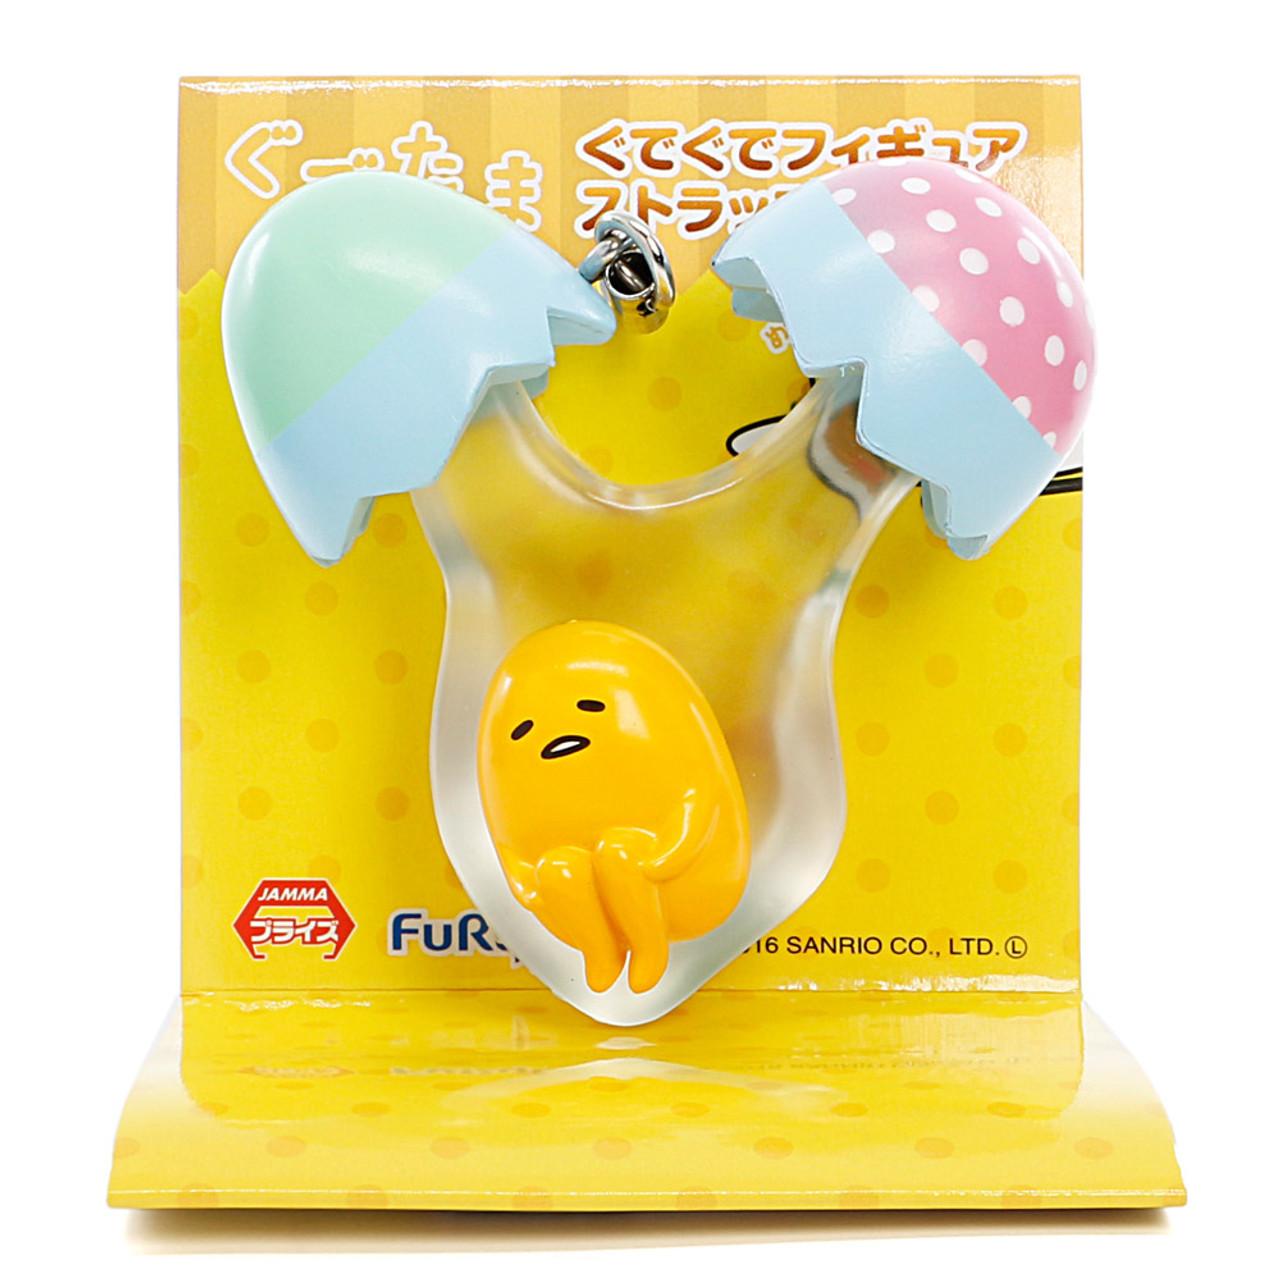 Sanrio Gudetama Lazy Egg Omelet Mascot Mobile Charms - Peel The Egg ( Font View )